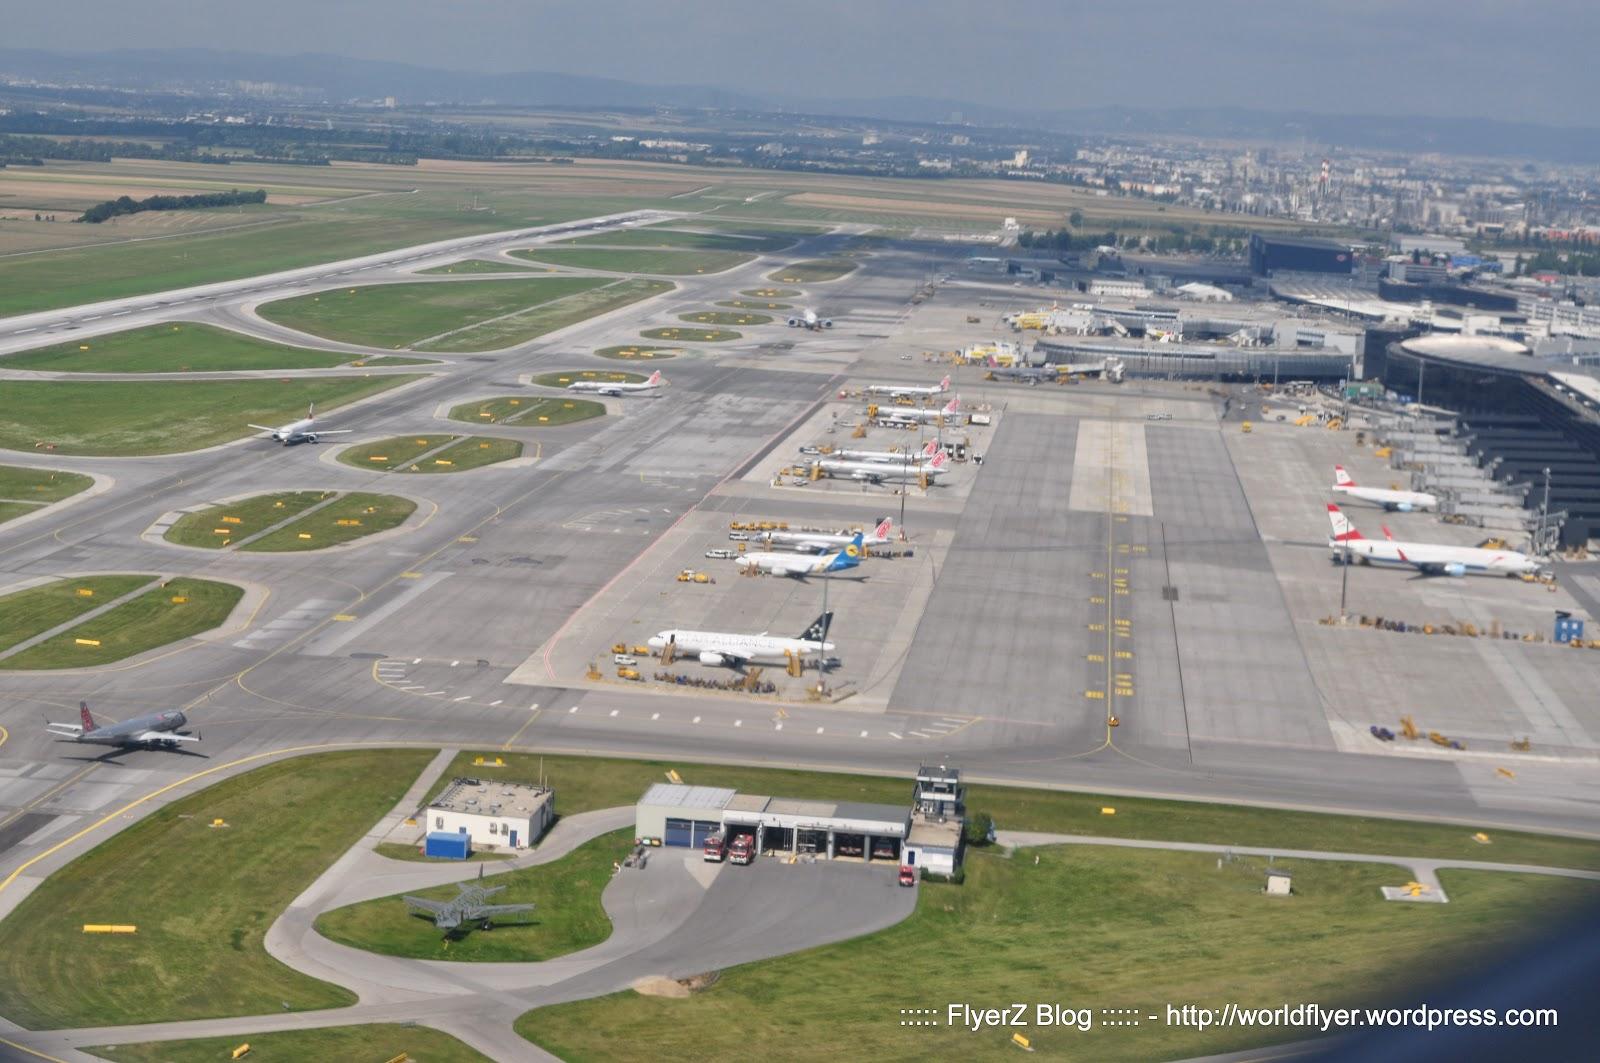 Aeroporto Vienna : Finnair vienna helsinki new delhi business class